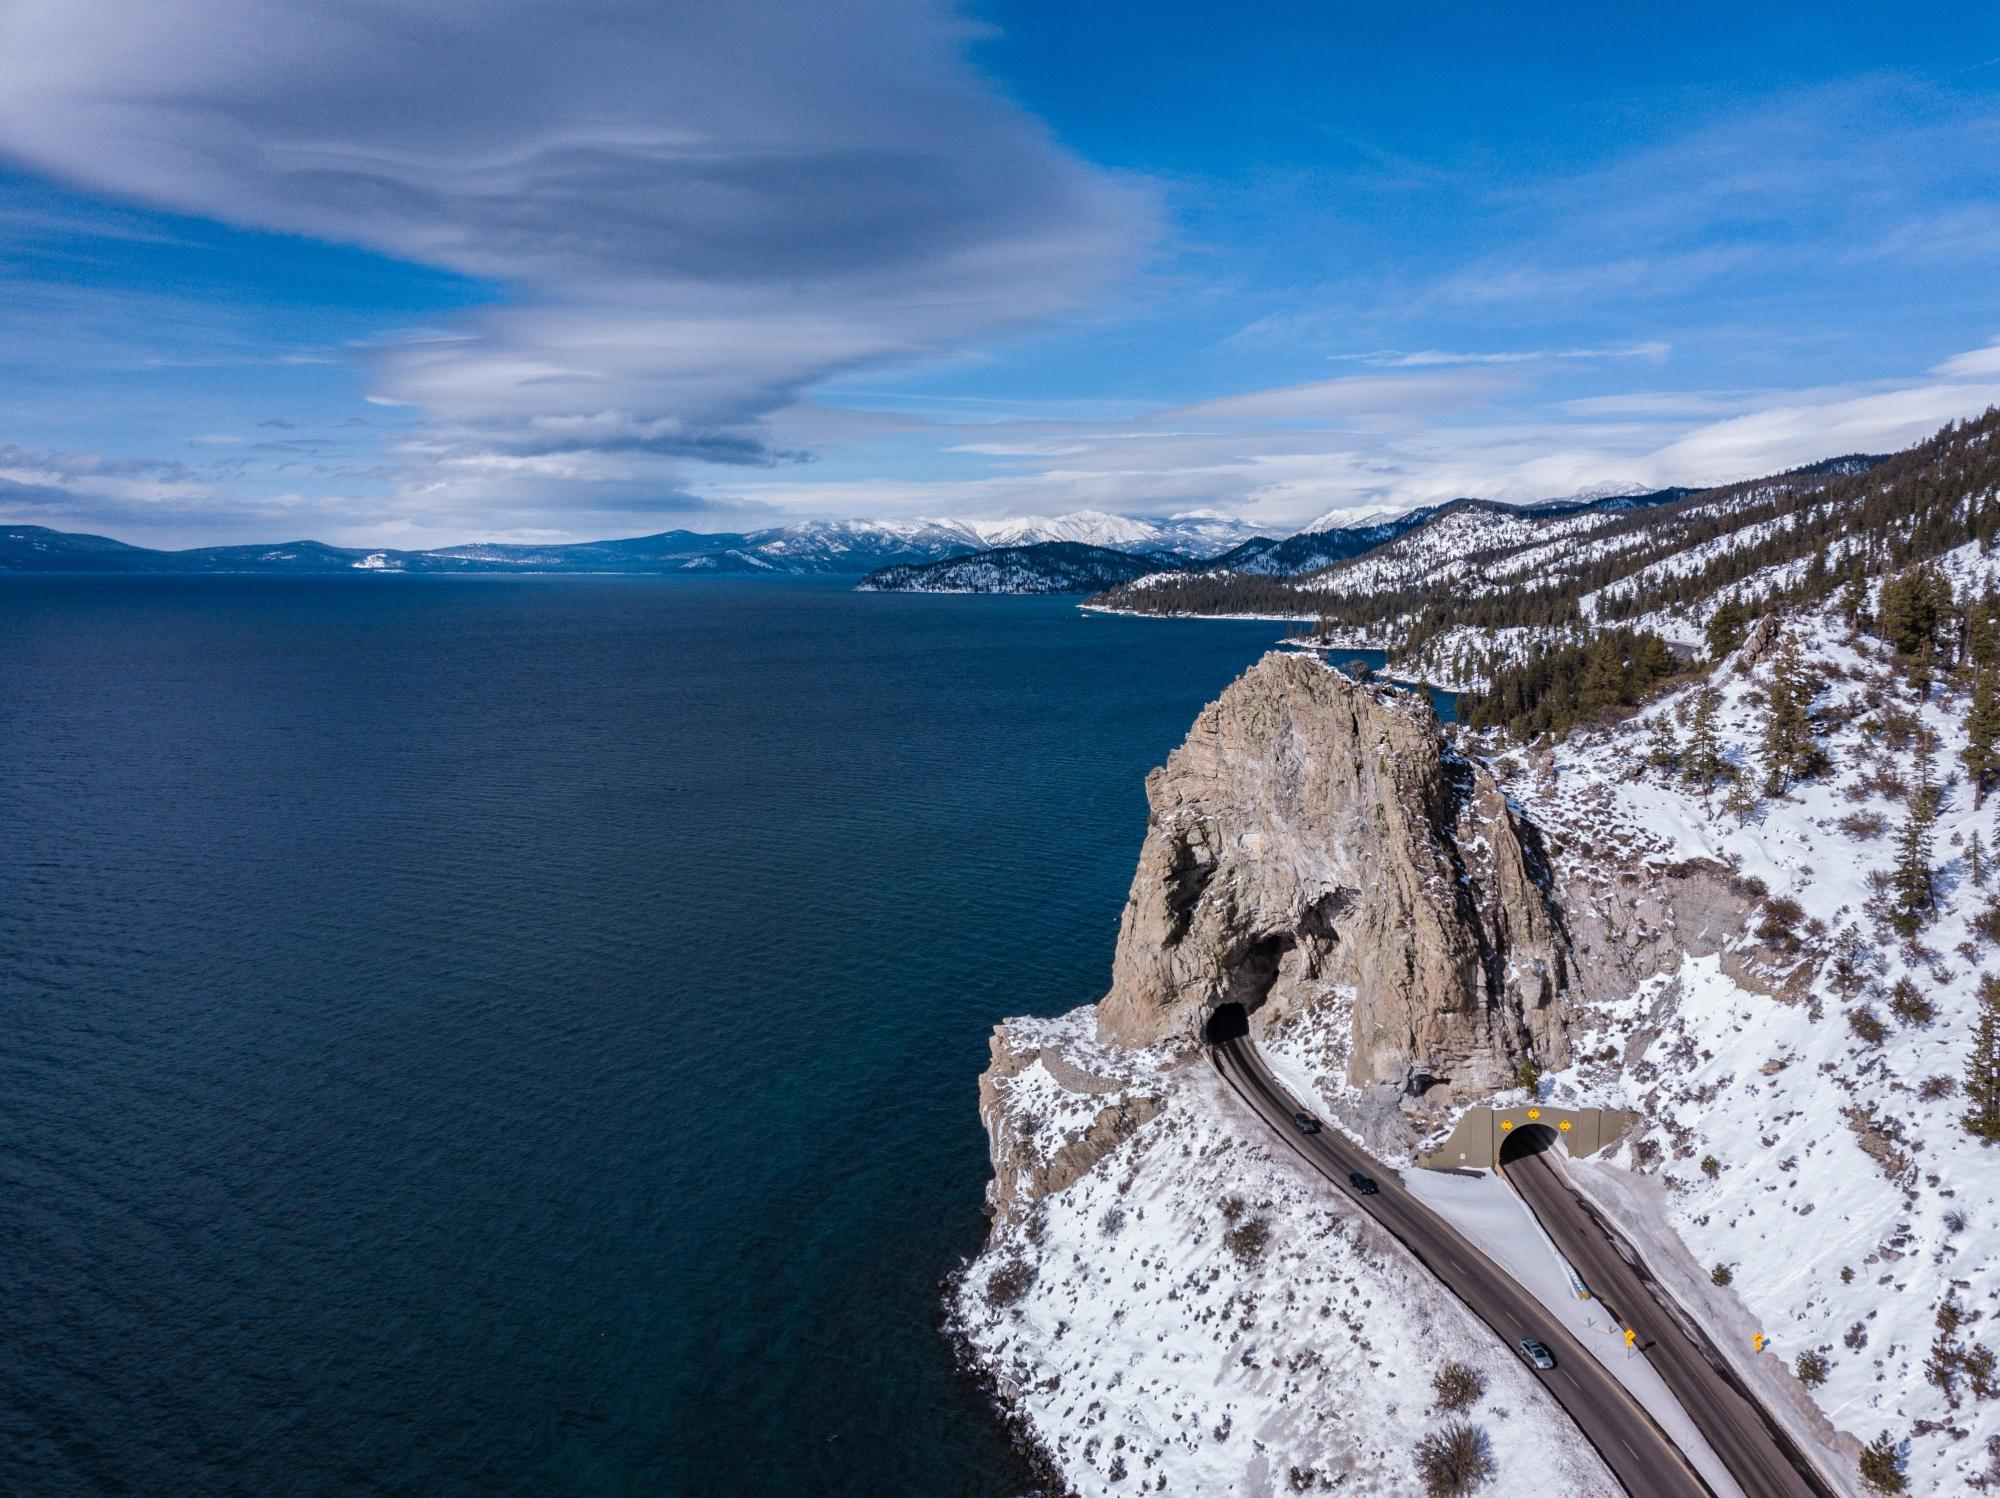 hight resolution of cave rock lake tahoe mavic pro 1st gen edited in lightroom